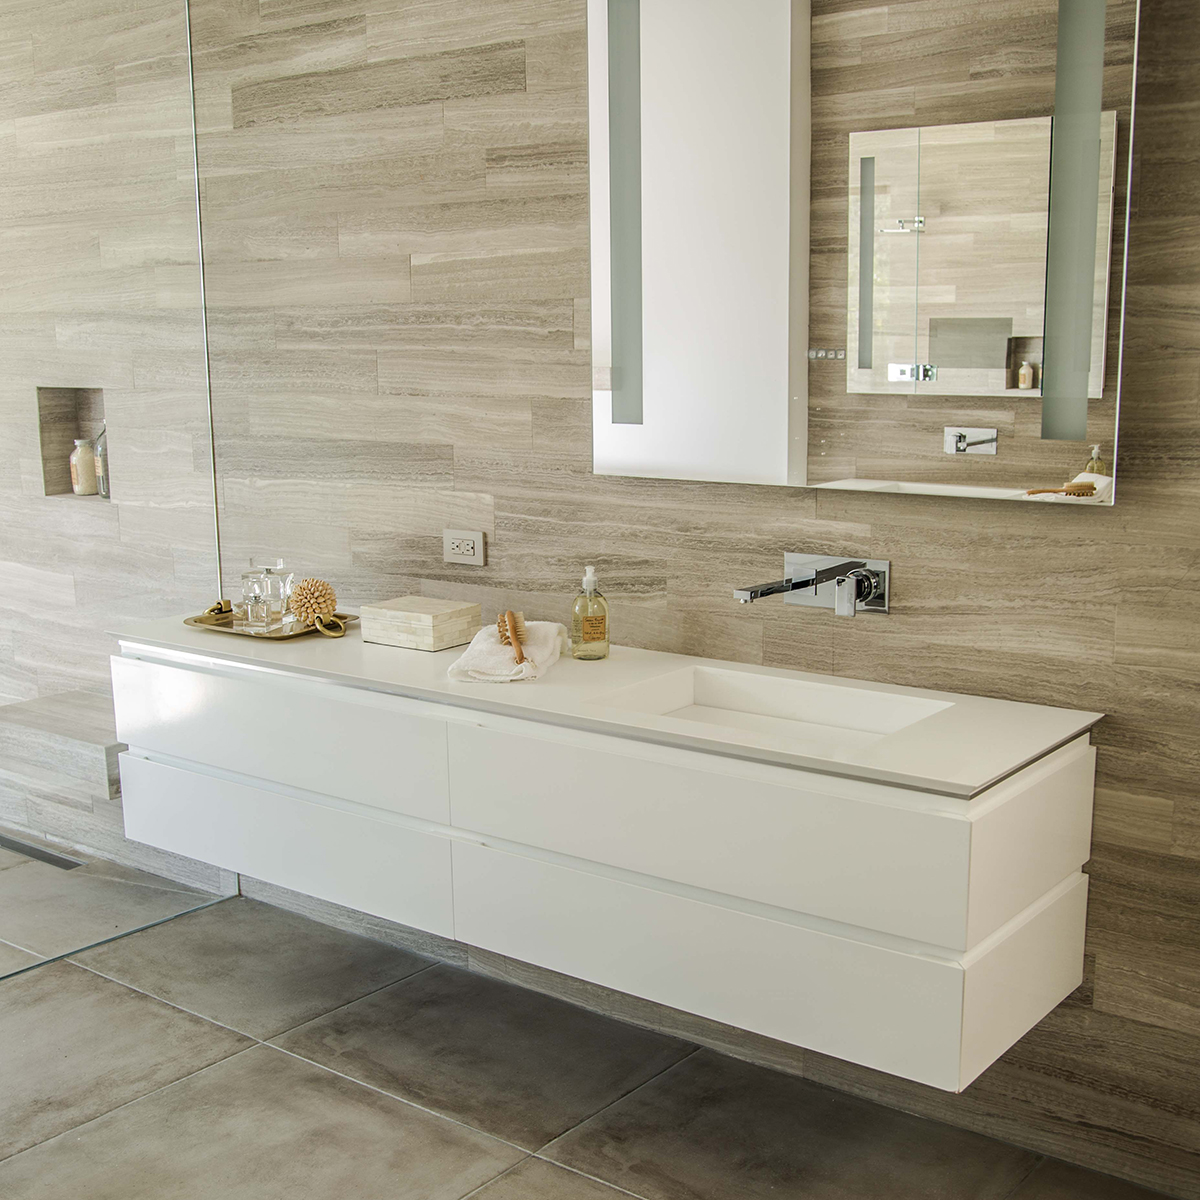 Custom Bathroom Vanity Cabinets Archives - RTA Cabinet Work